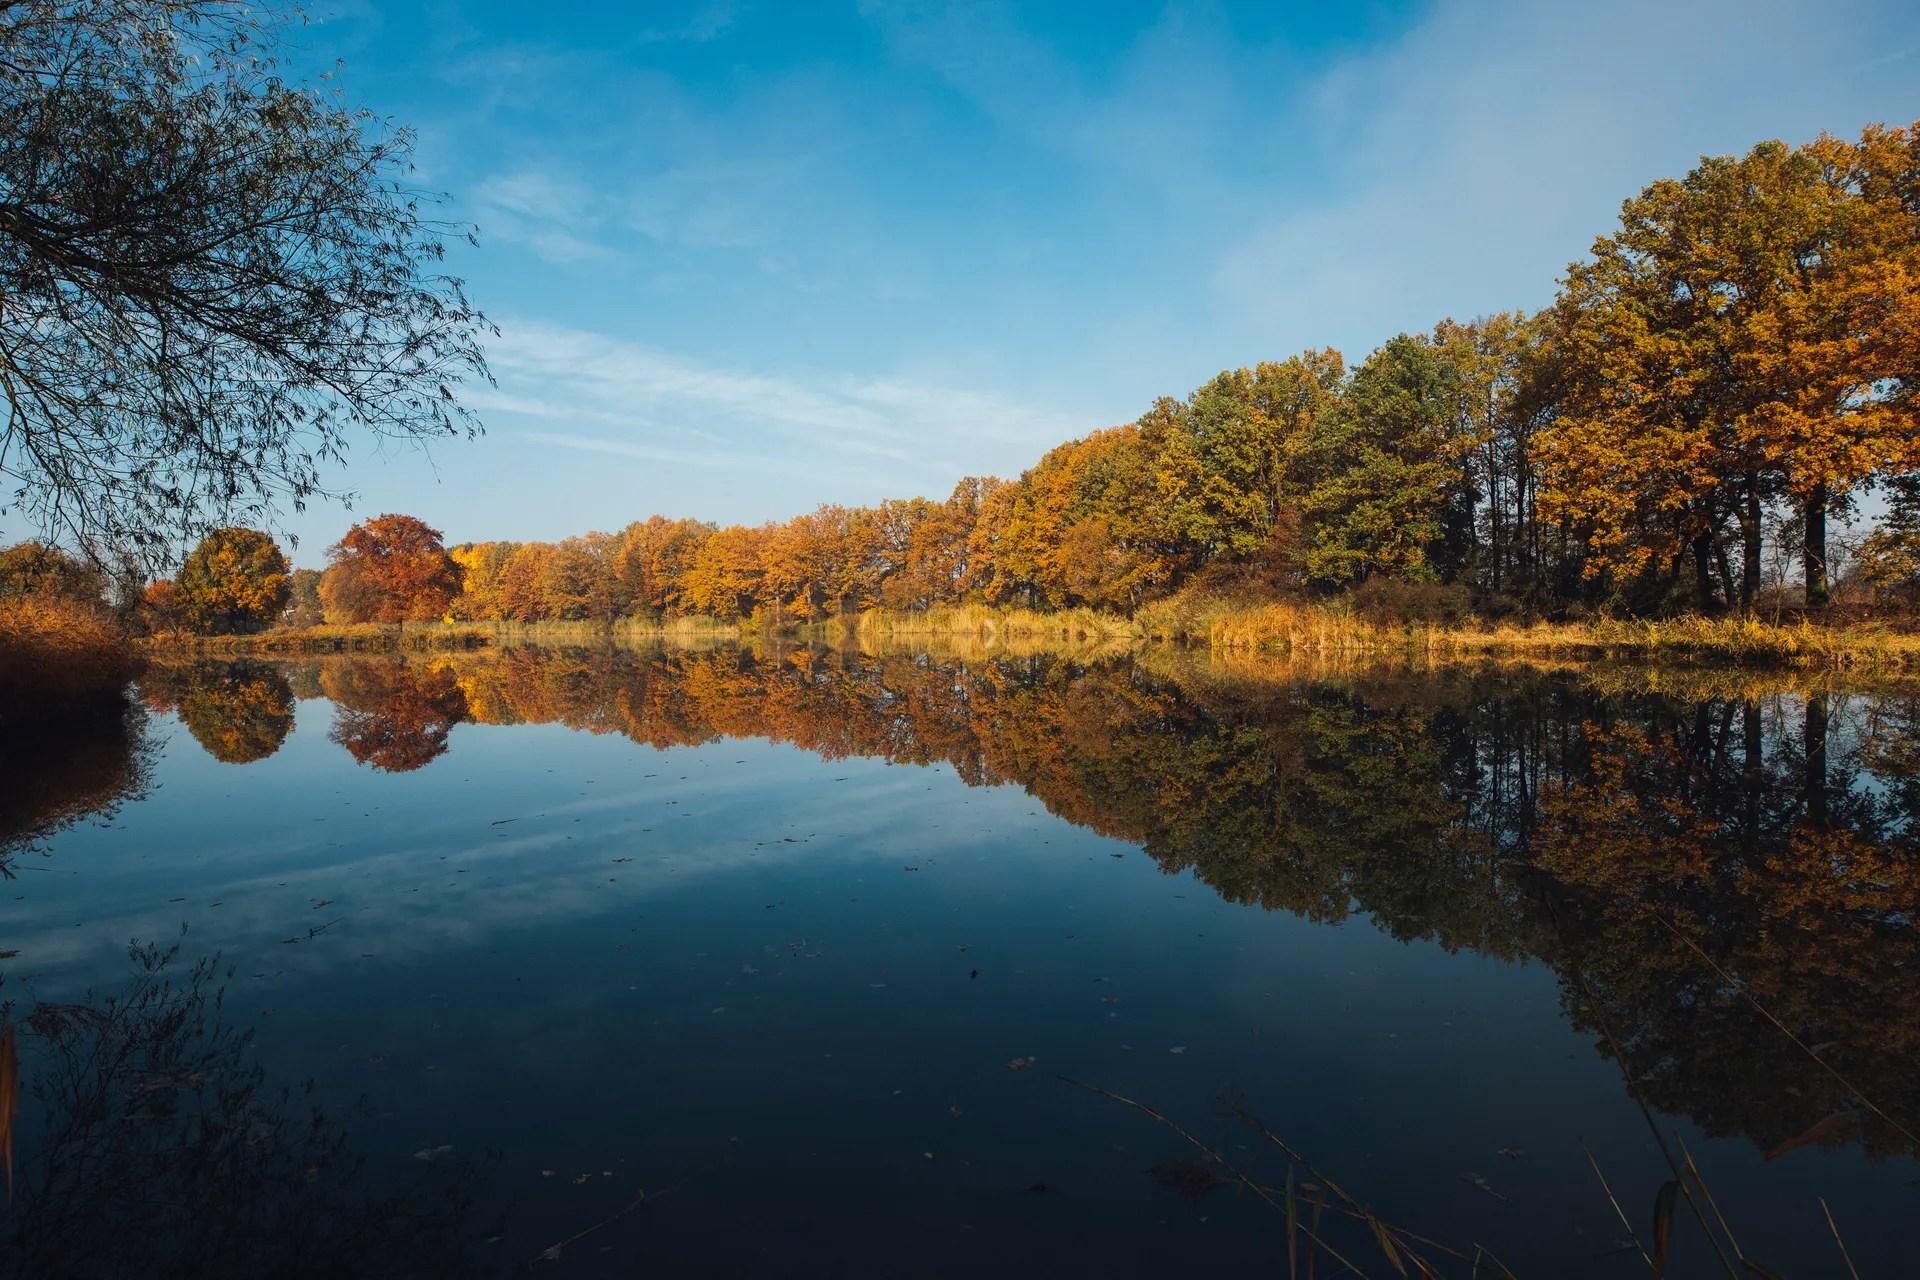 Fall Wallpaper Screensavers Decorated Tree River Christmas Lights In San Antonio